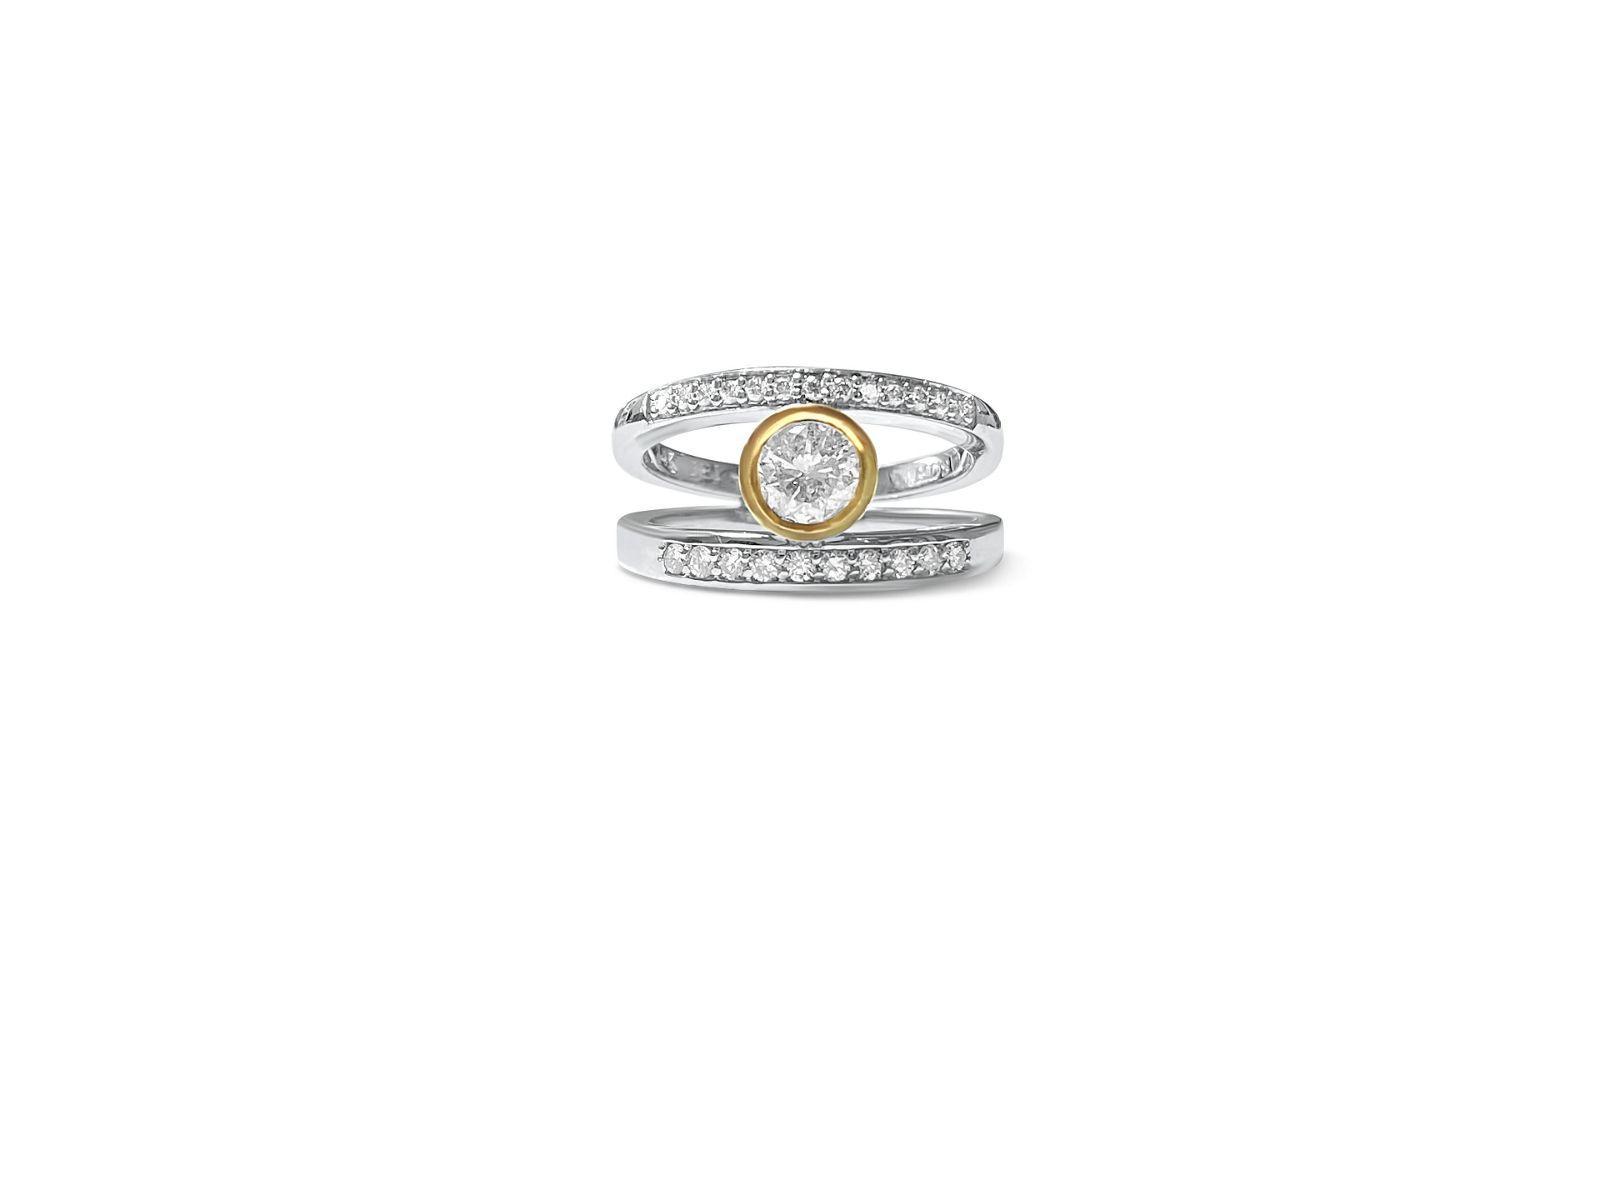 Vintage 14K two tone, 0.76ct Diamond Engagement Ring